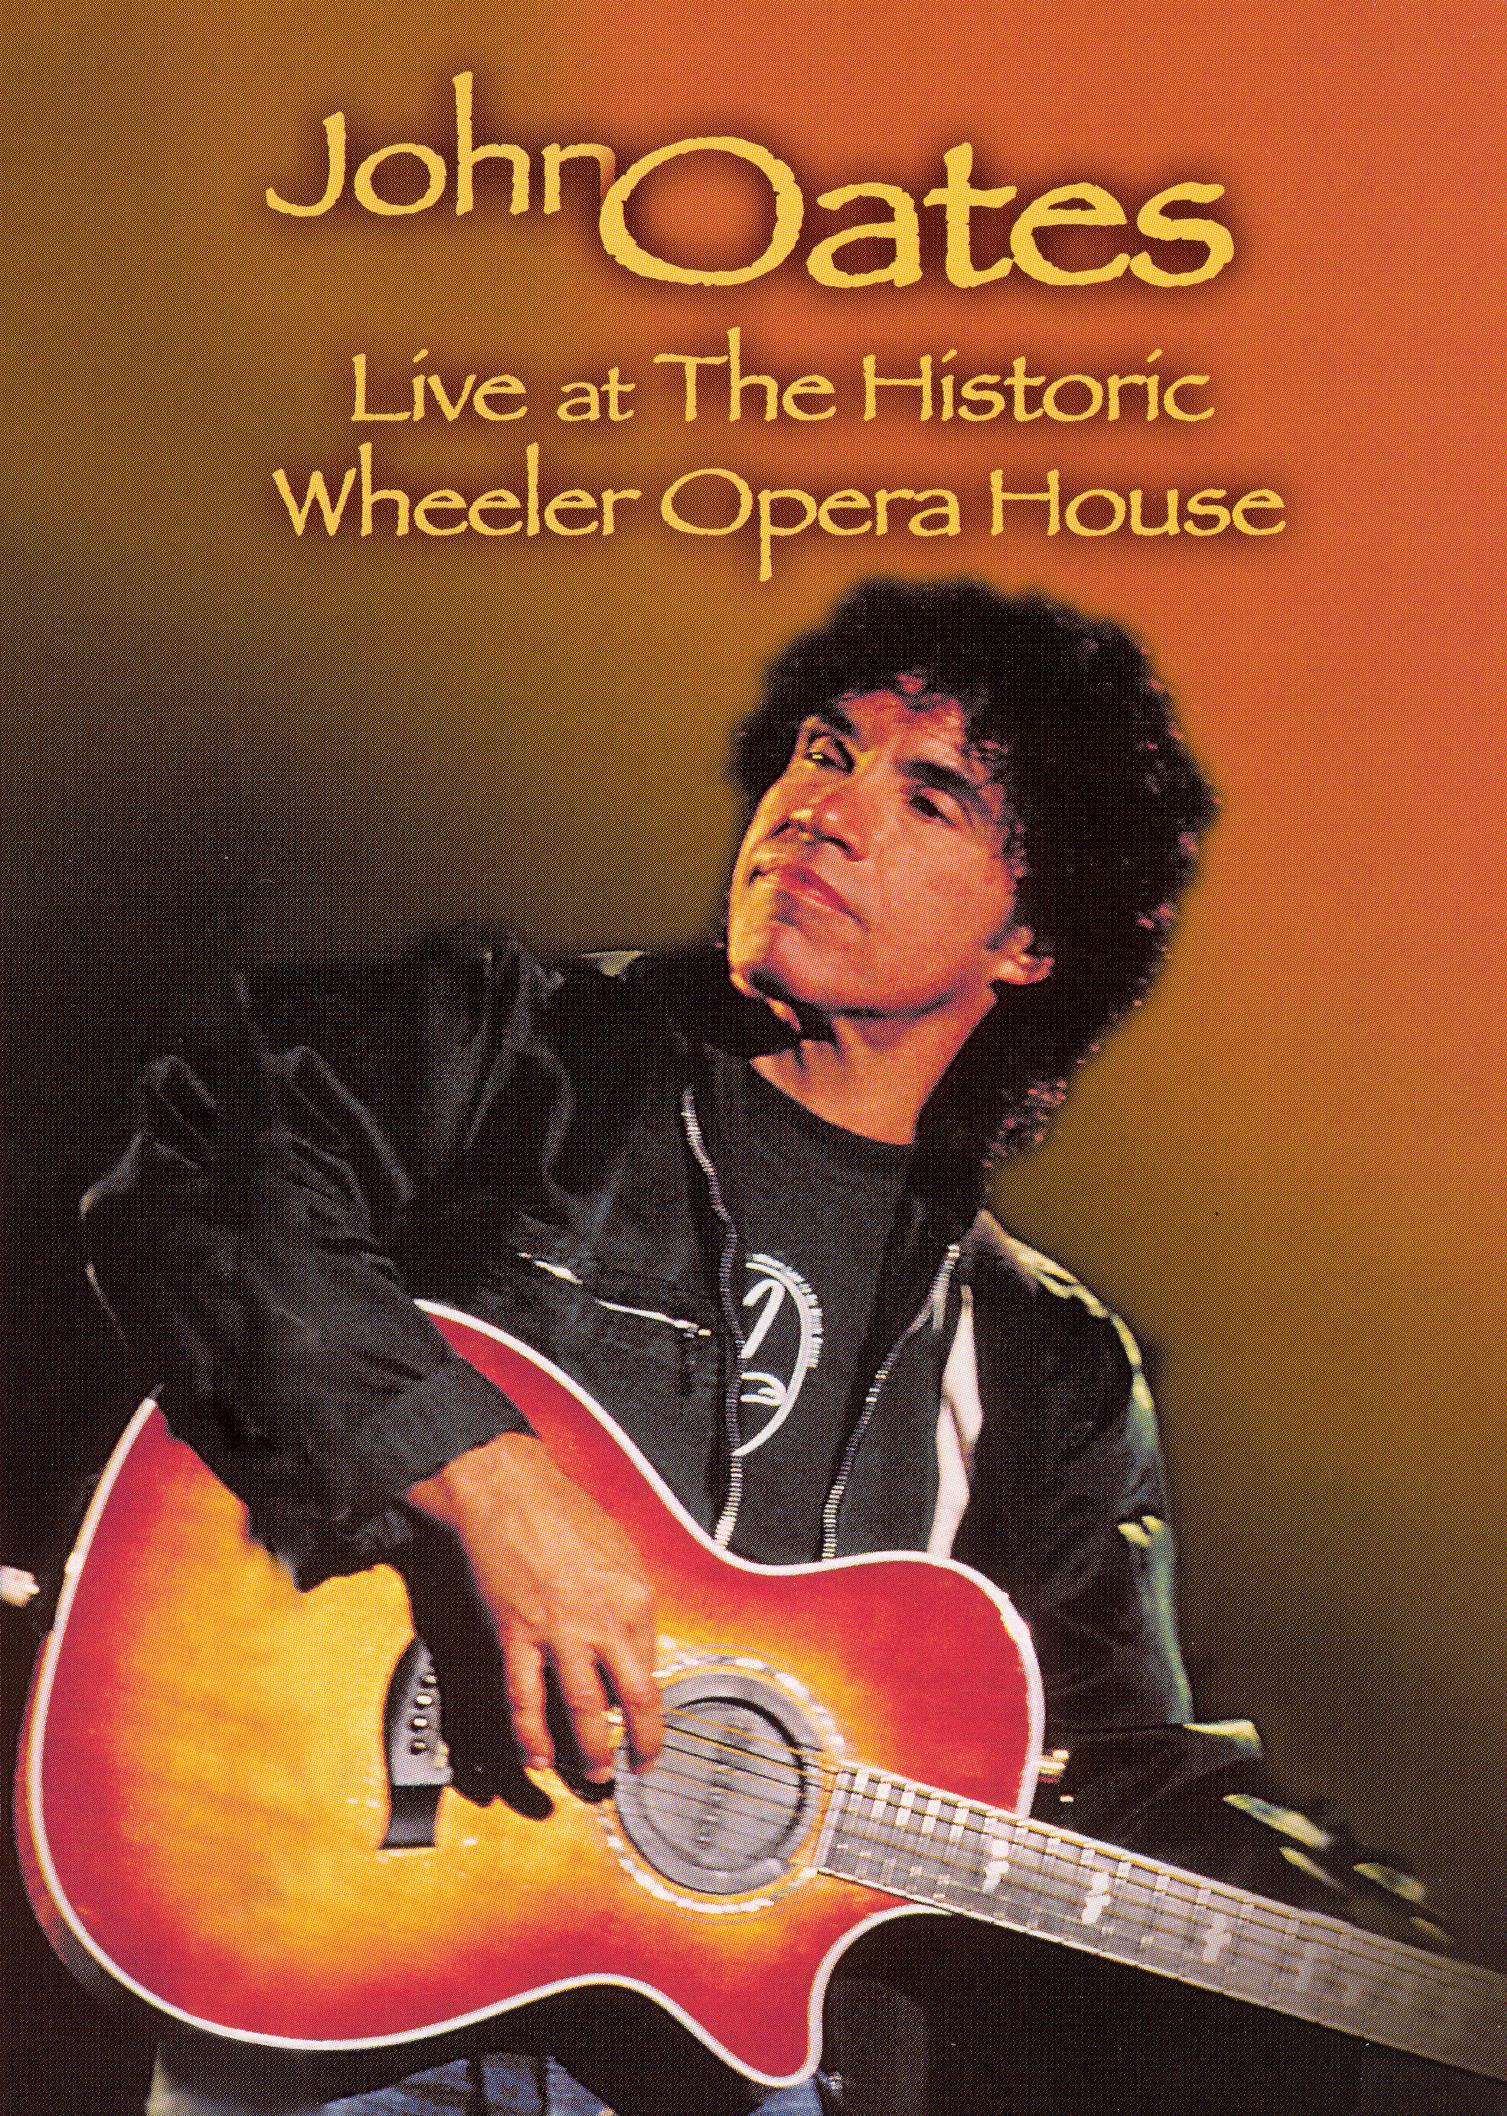 John Oates: Live at the Historic Wheeler Opera House